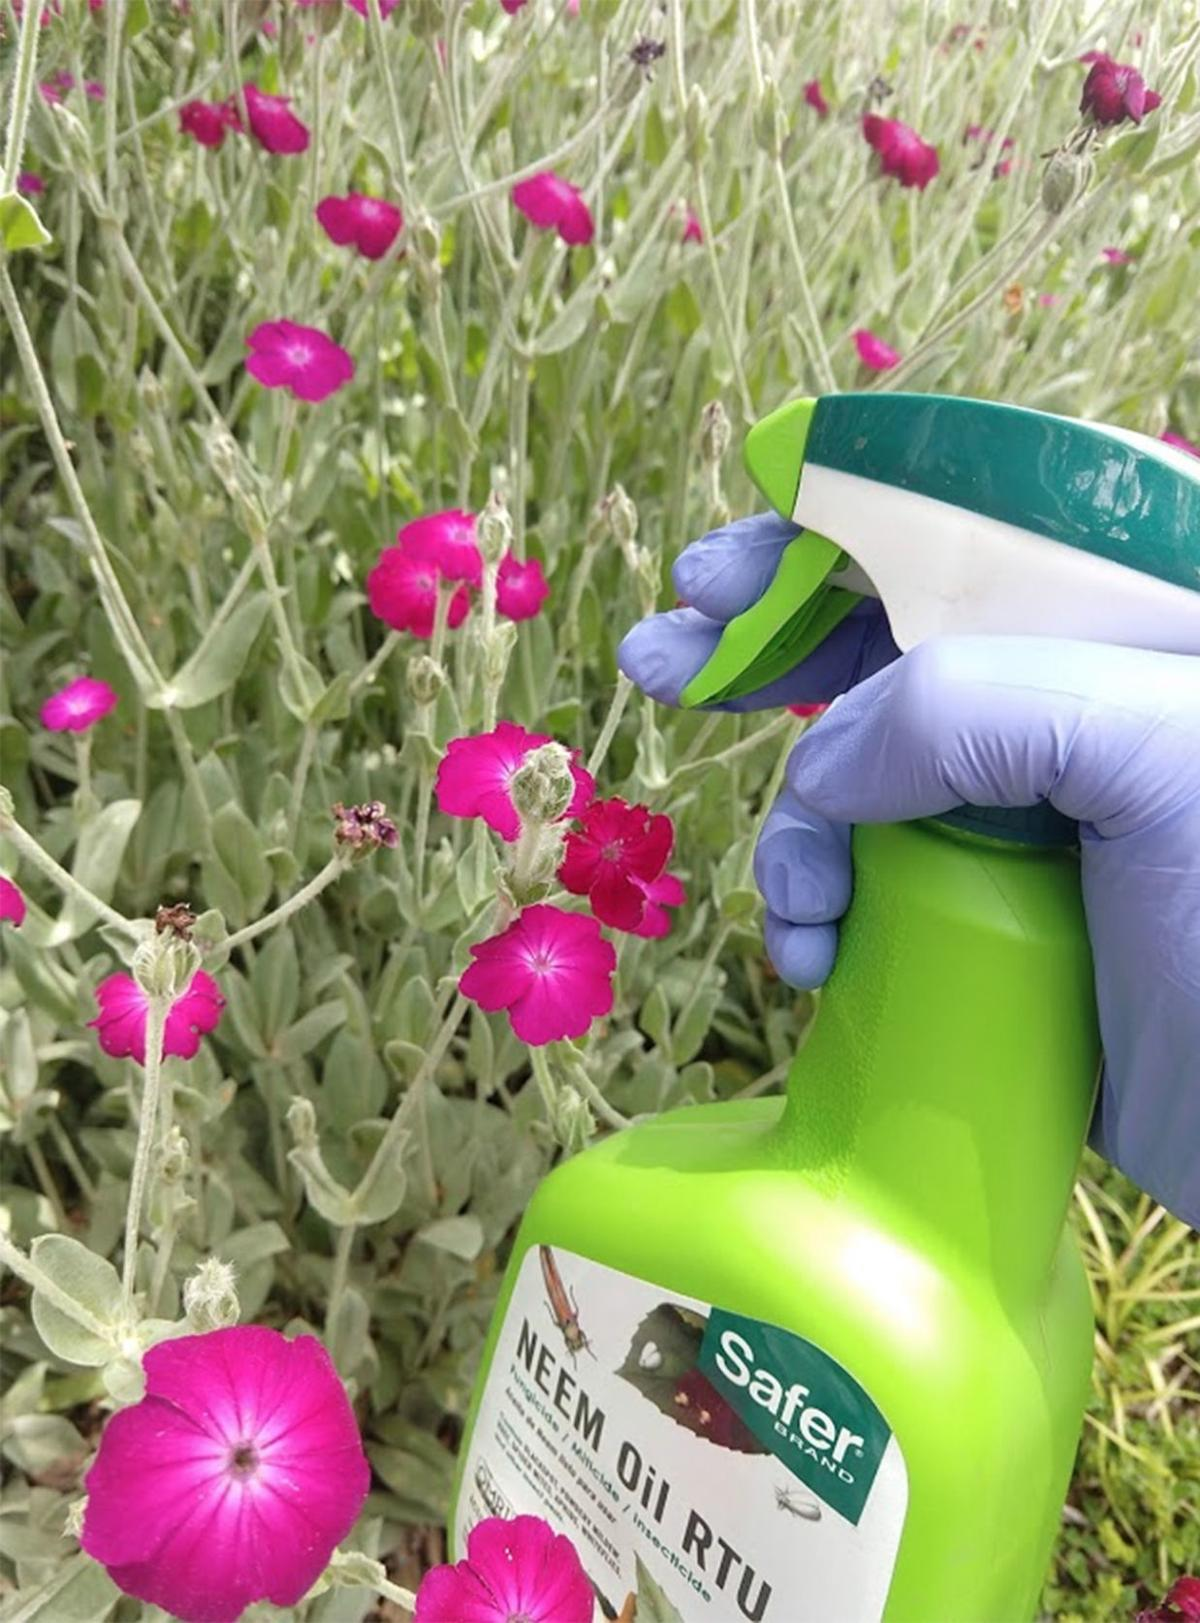 Spraying flowers